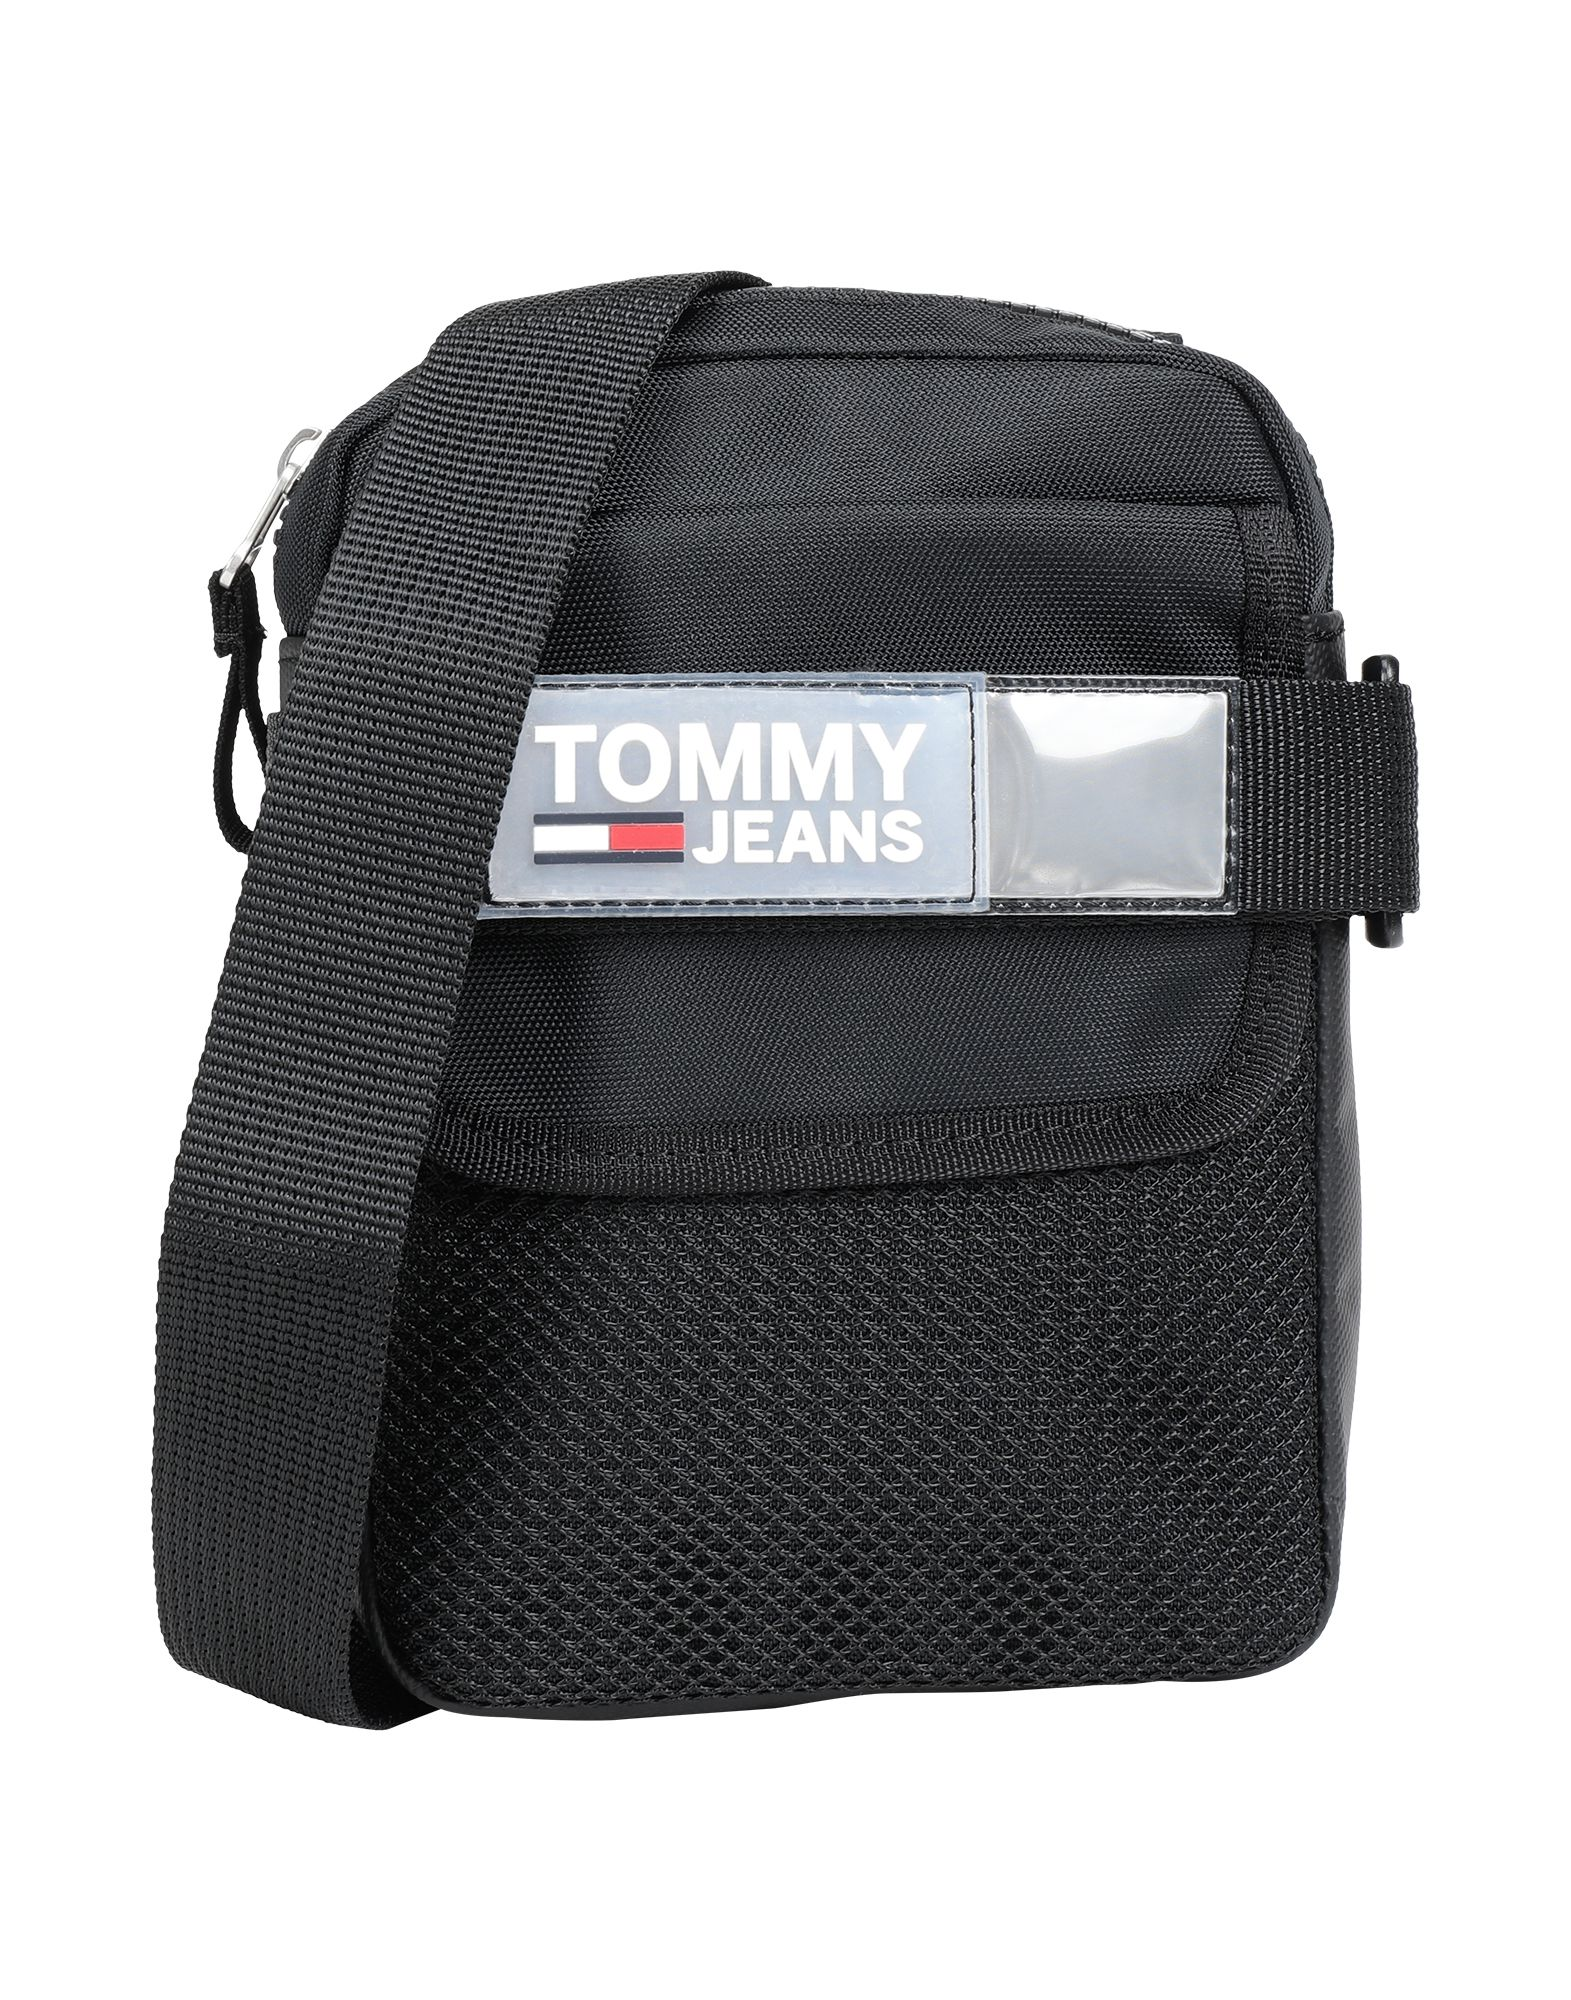 Фото - TOMMY JEANS Сумка через плечо trussardi jeans сумка через плечо